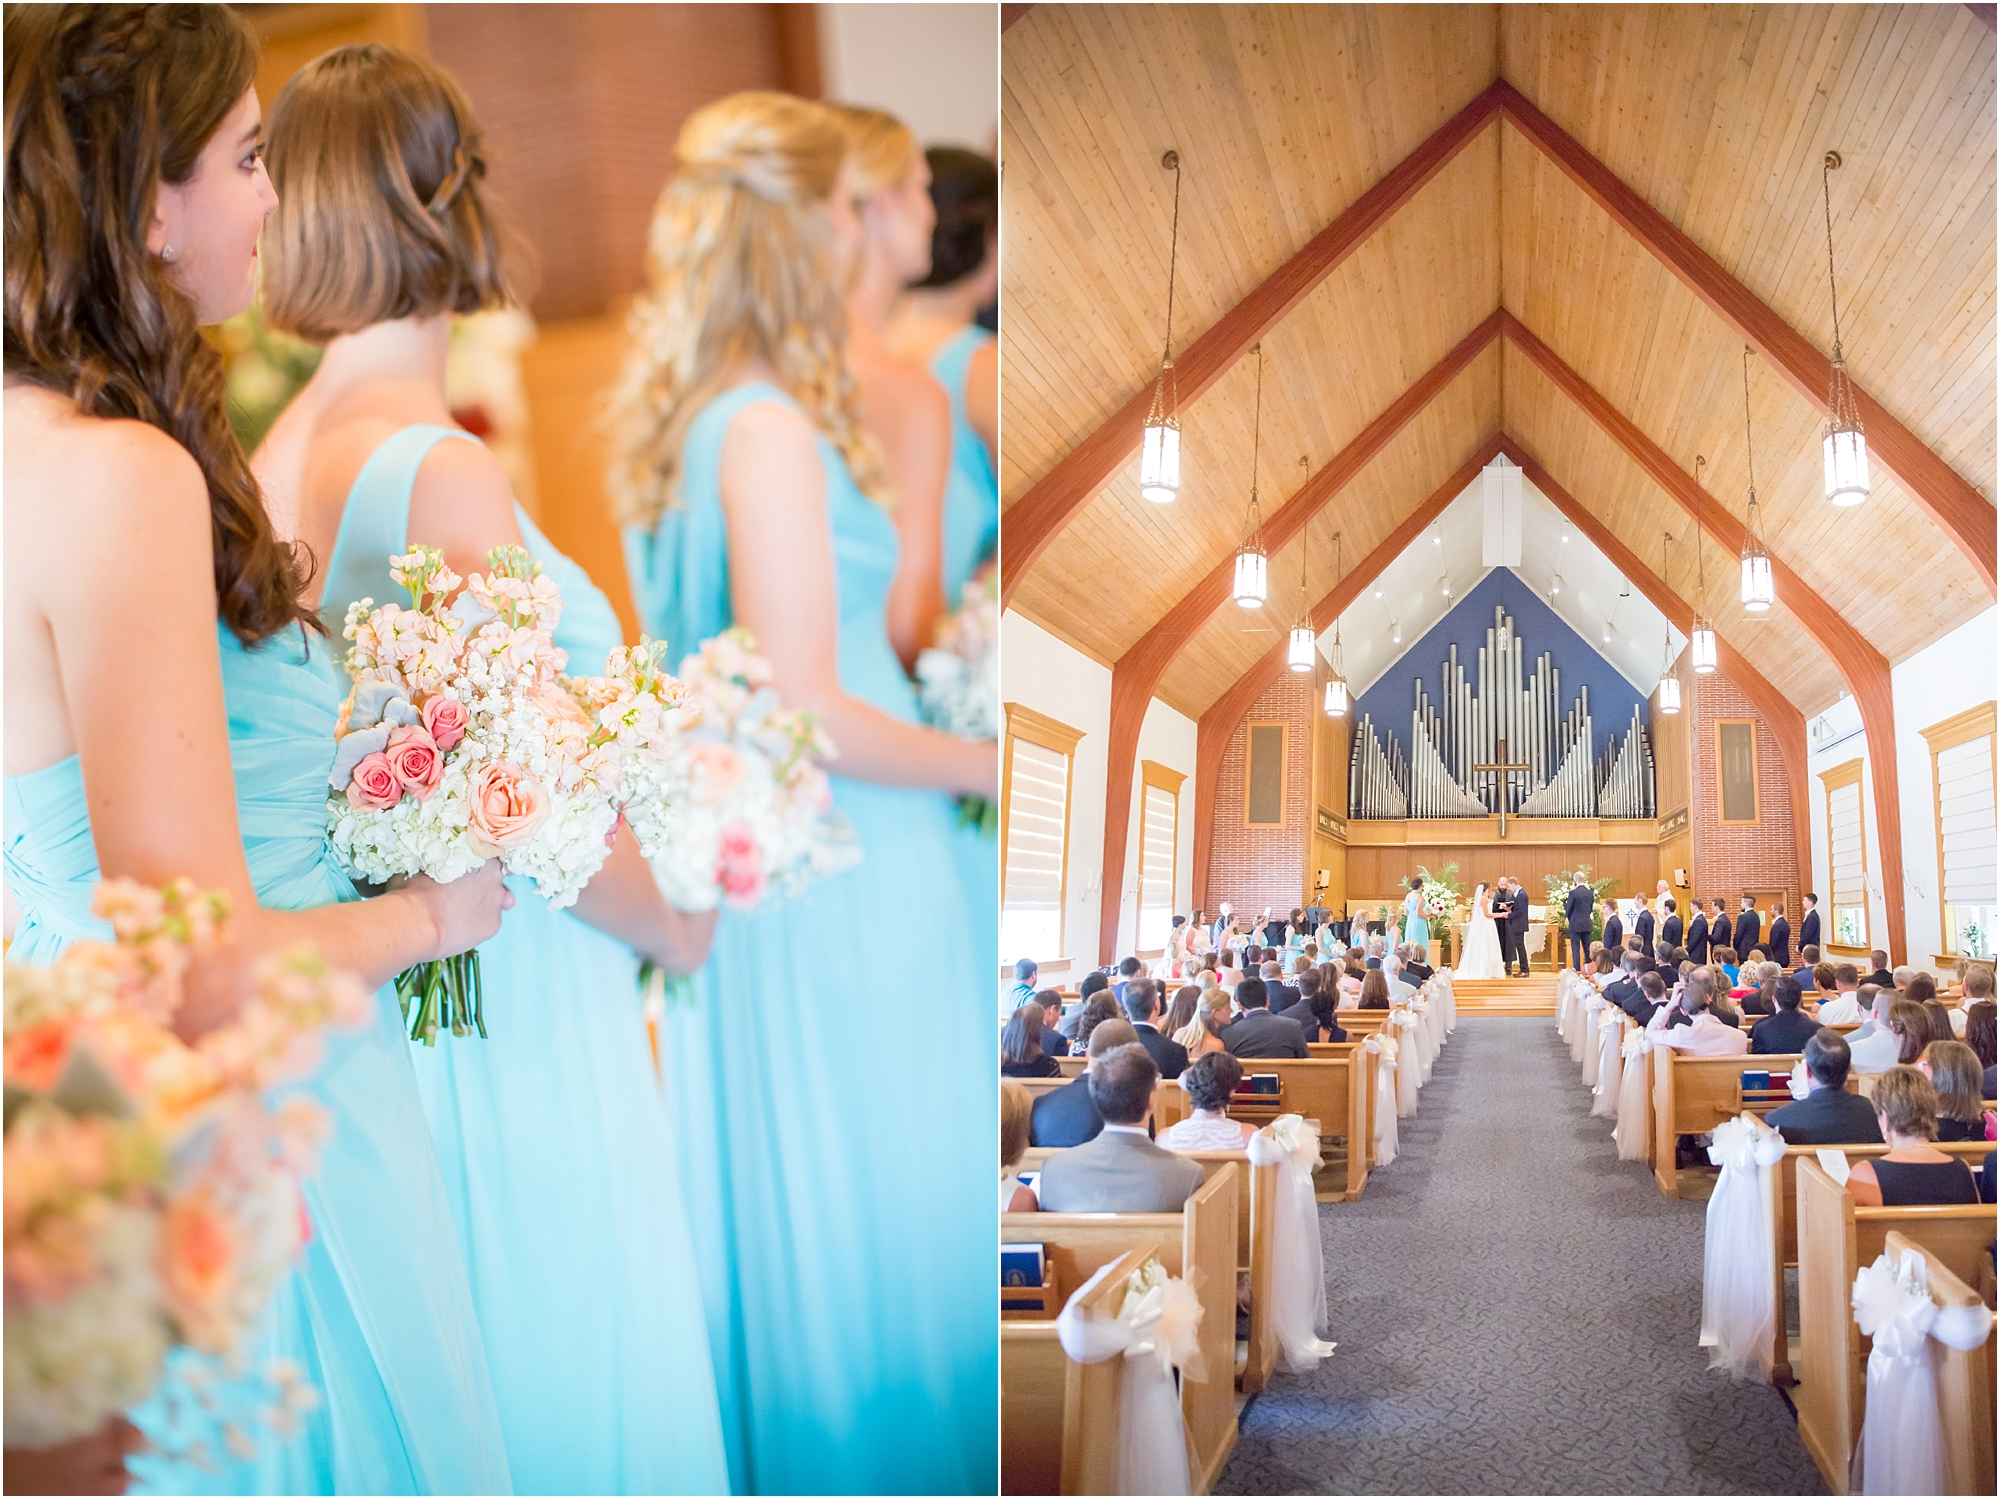 Russell 3-Ceremony-485_anna grace photography baltimore maryland wedding photographer elkridge furnace inn wedding photo.jpg